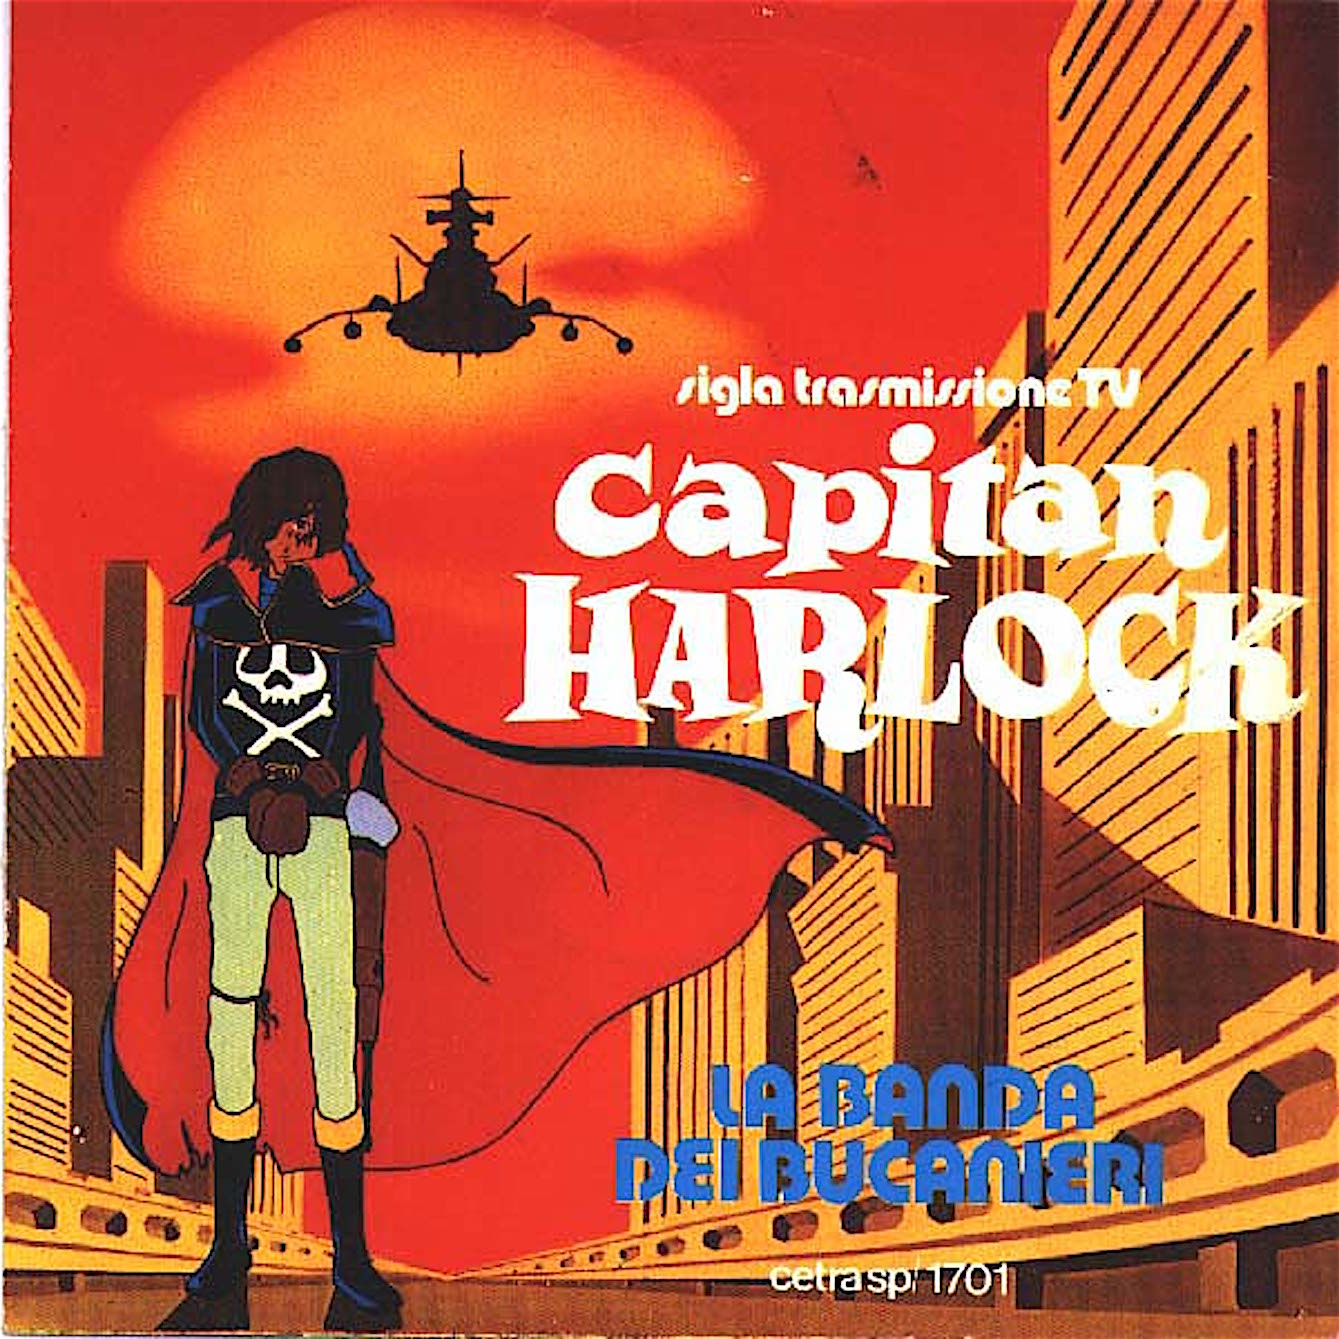 Capitan harlock anime curiosando anni